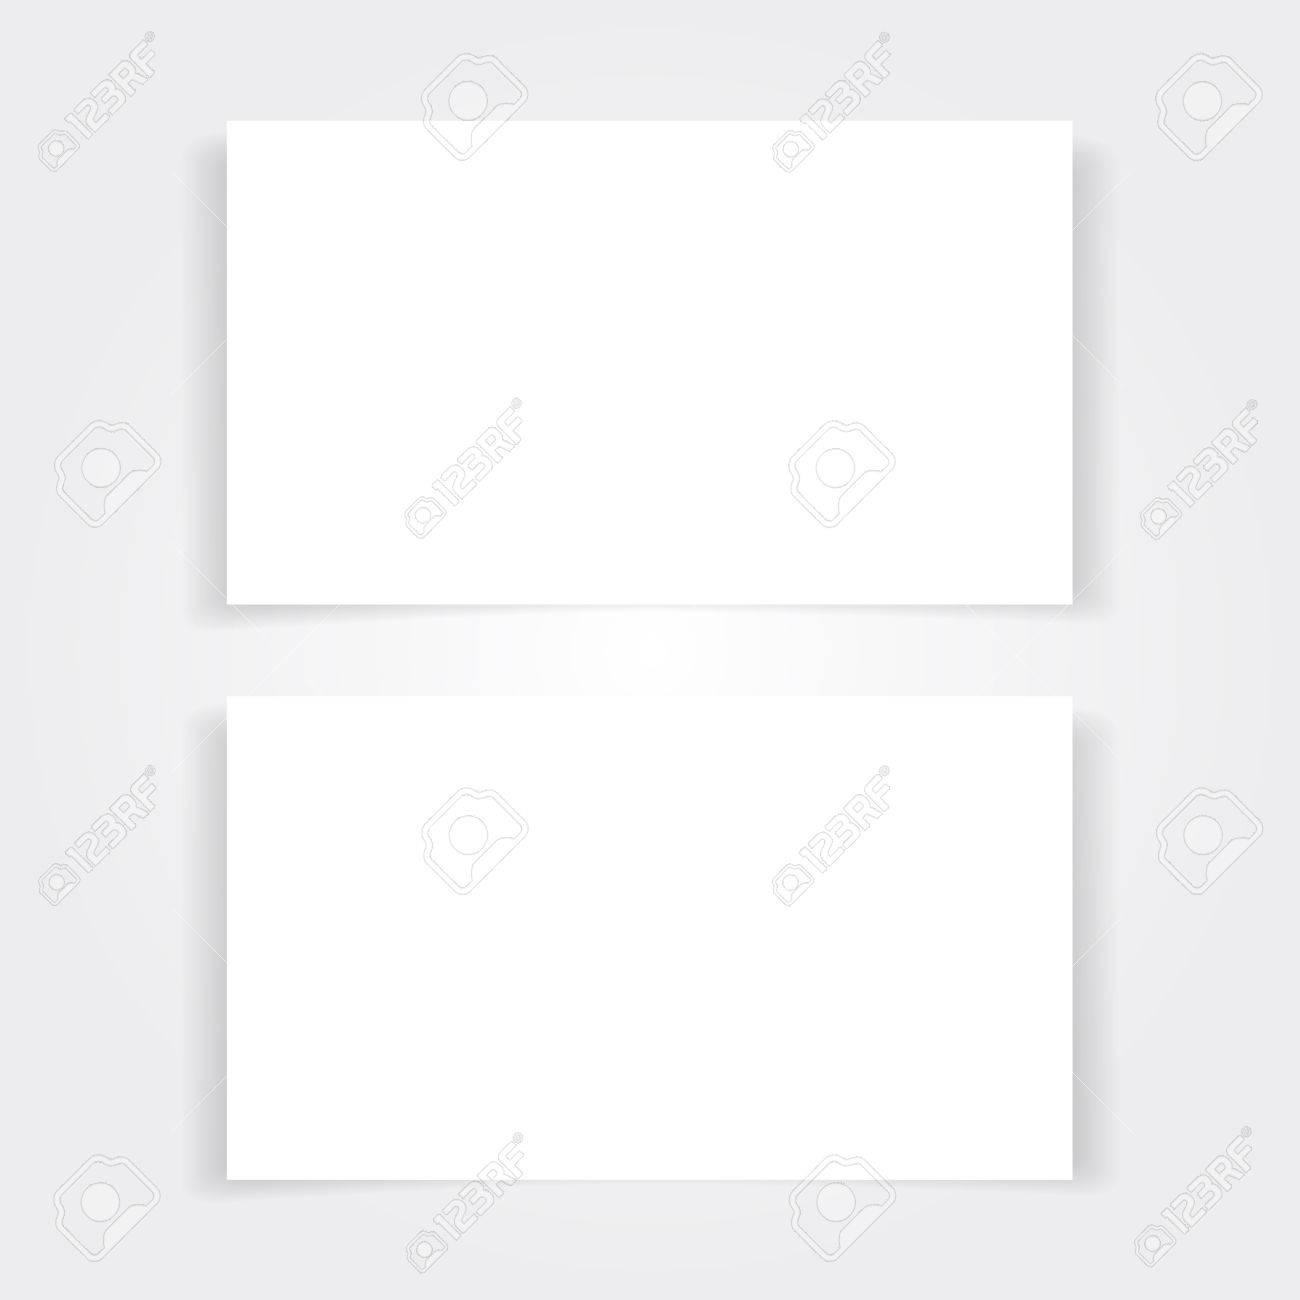 Blank business card mock up set branding template with place blank business card mock up set branding template with place for name address and reheart Choice Image